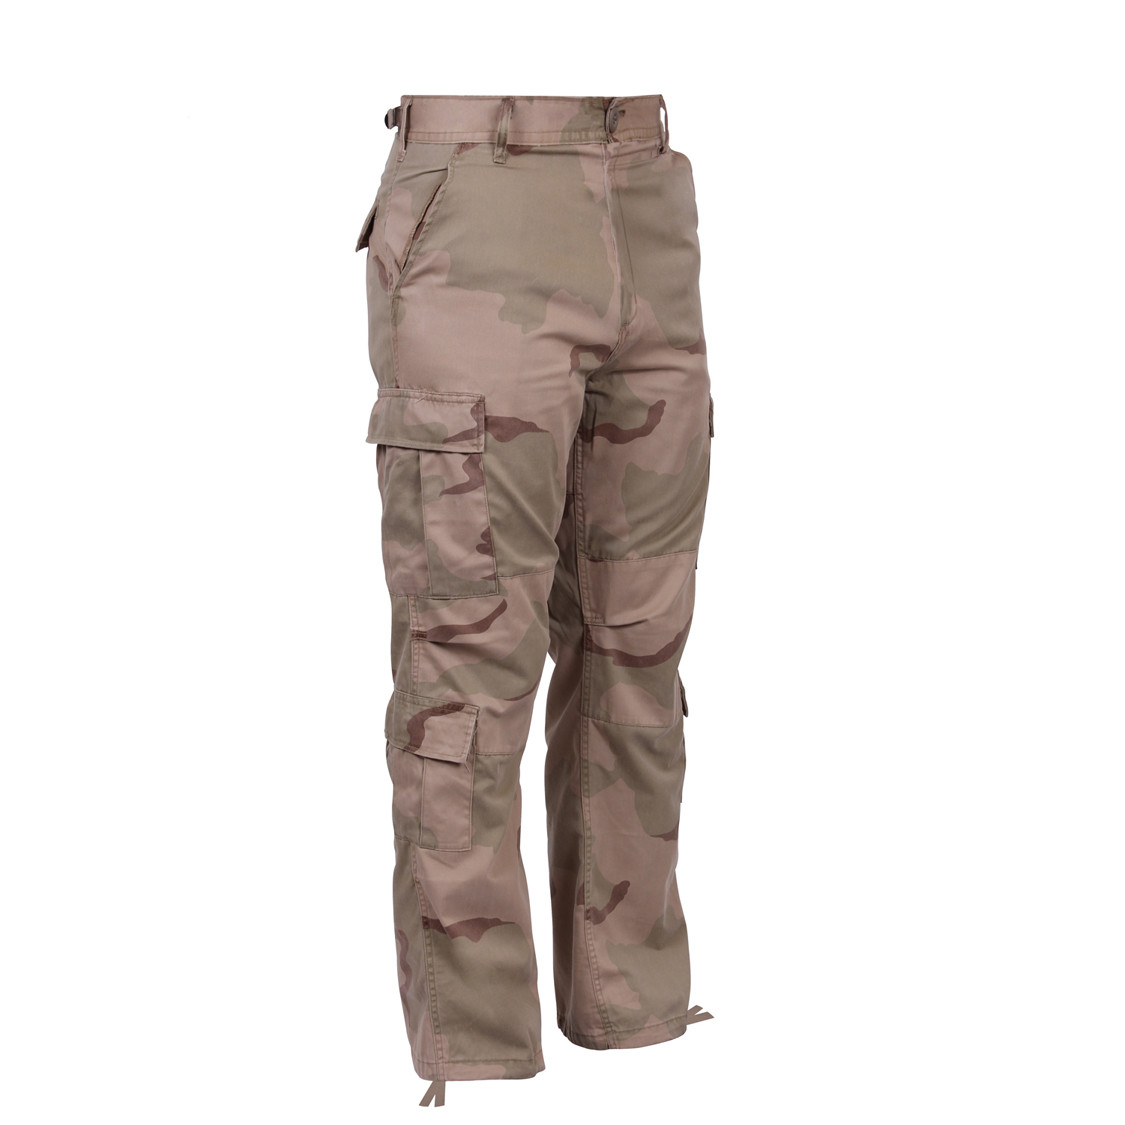 f6cc357e55 Shop Tri Color Desert Camo BDU Pants - Fatigues Army Navy